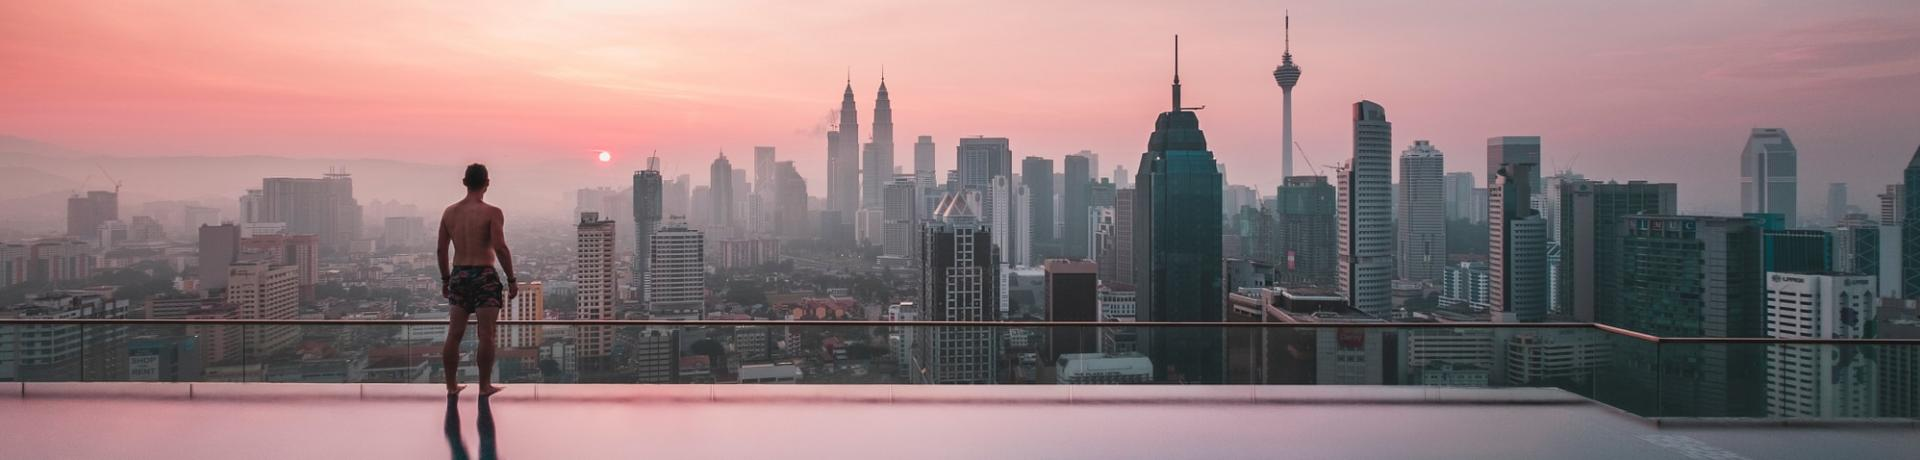 Malaysia-kuala-lumpur-emotion_GI-728921985.jpg